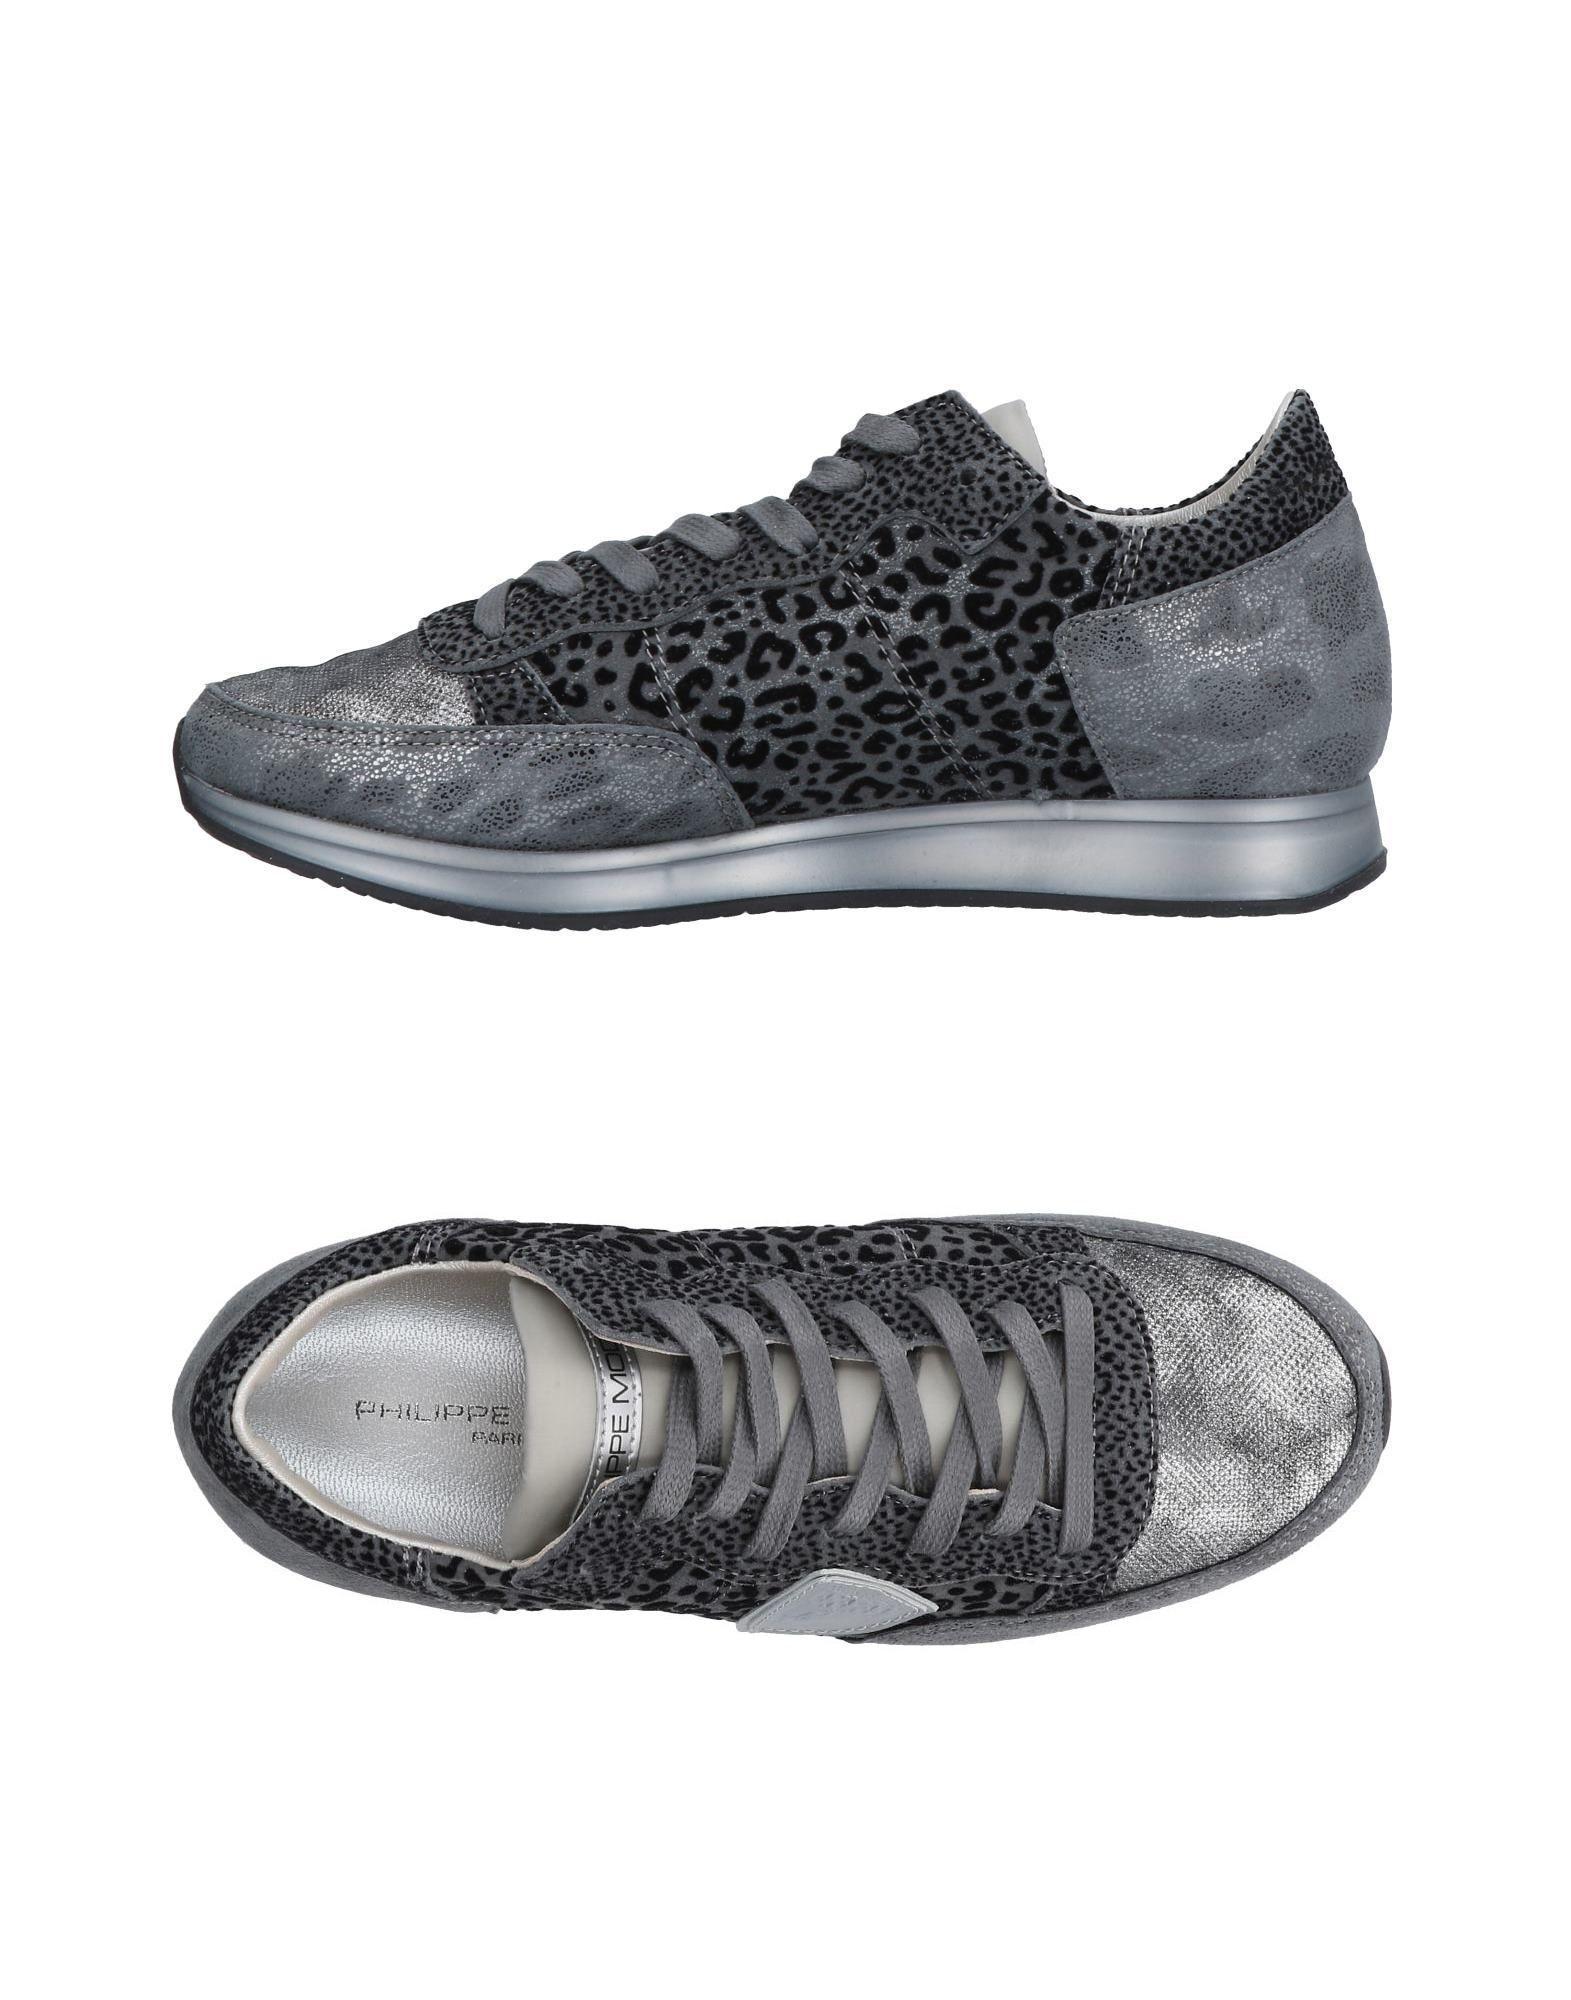 Philippe Model Sneakers In Lead